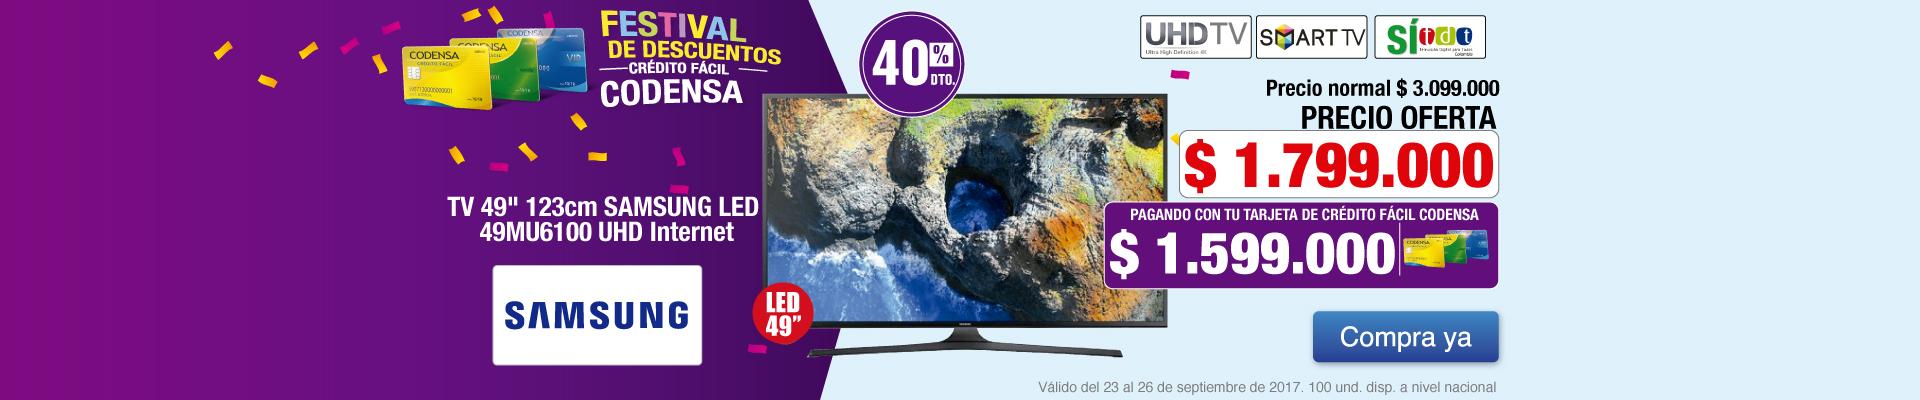 PPAL KT-3-TELEVISOR SG 49MU61-TV-SEPTIEMBRE23-26